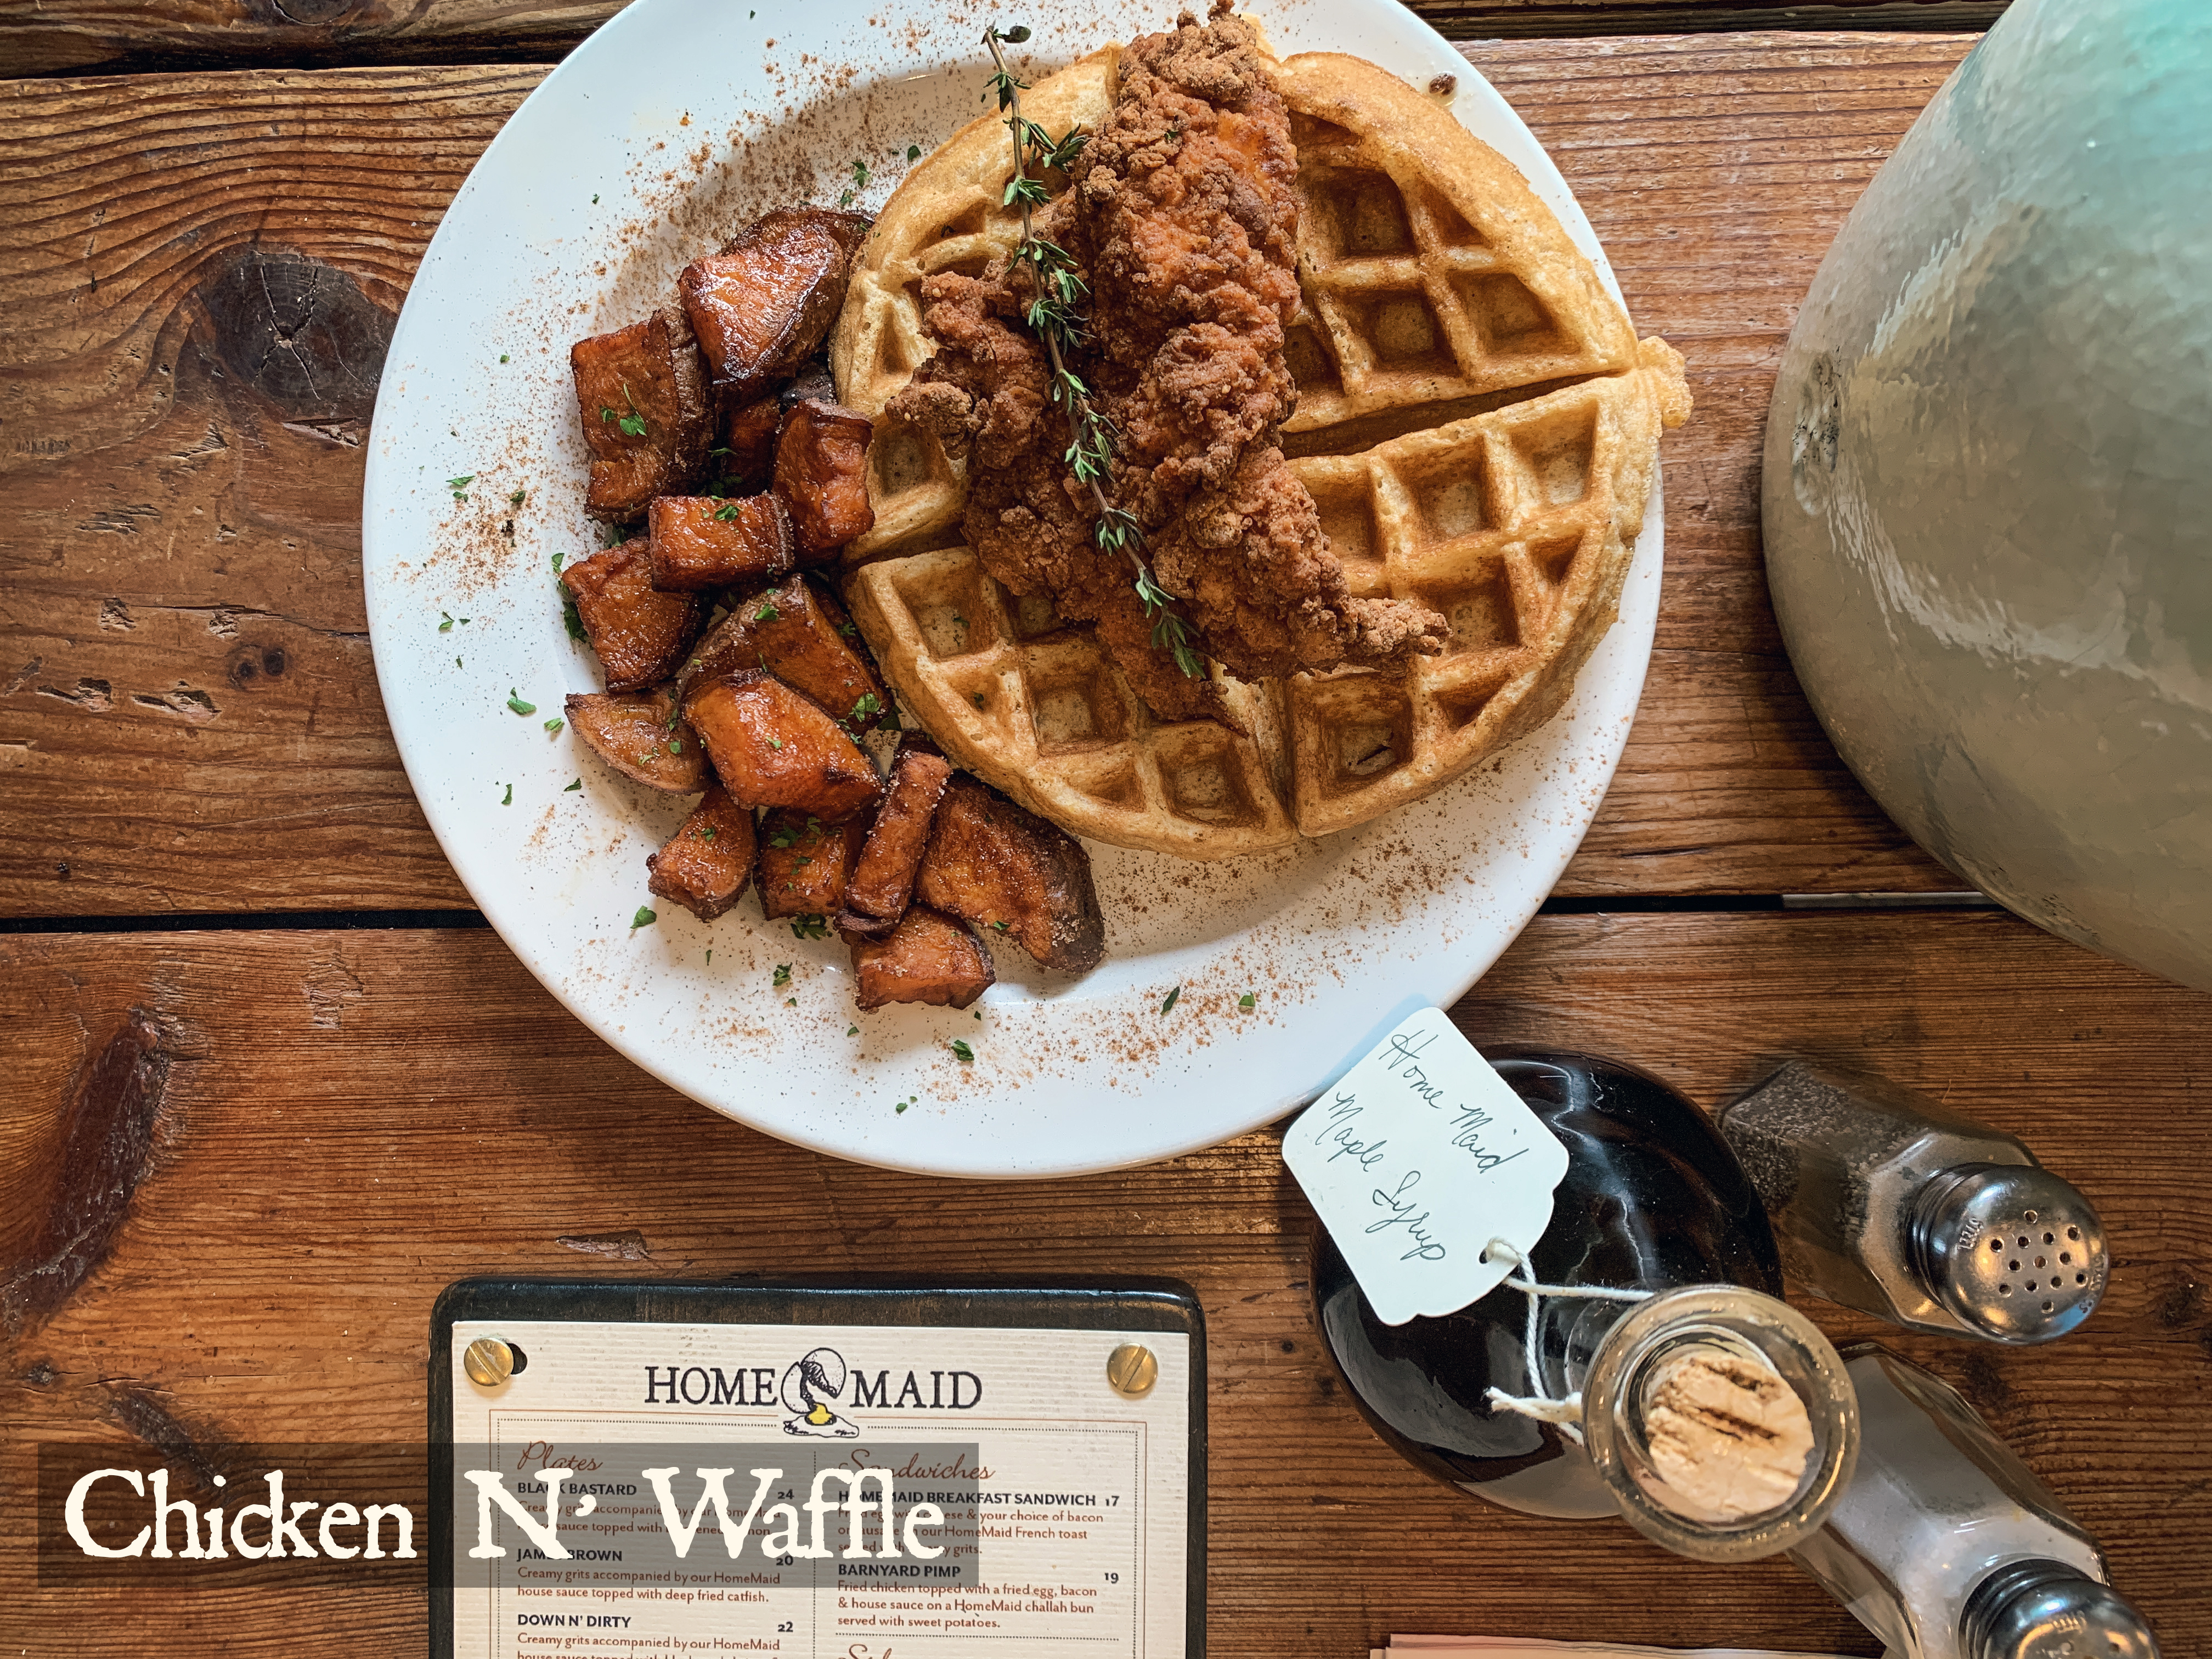 Chicken N' Waffle